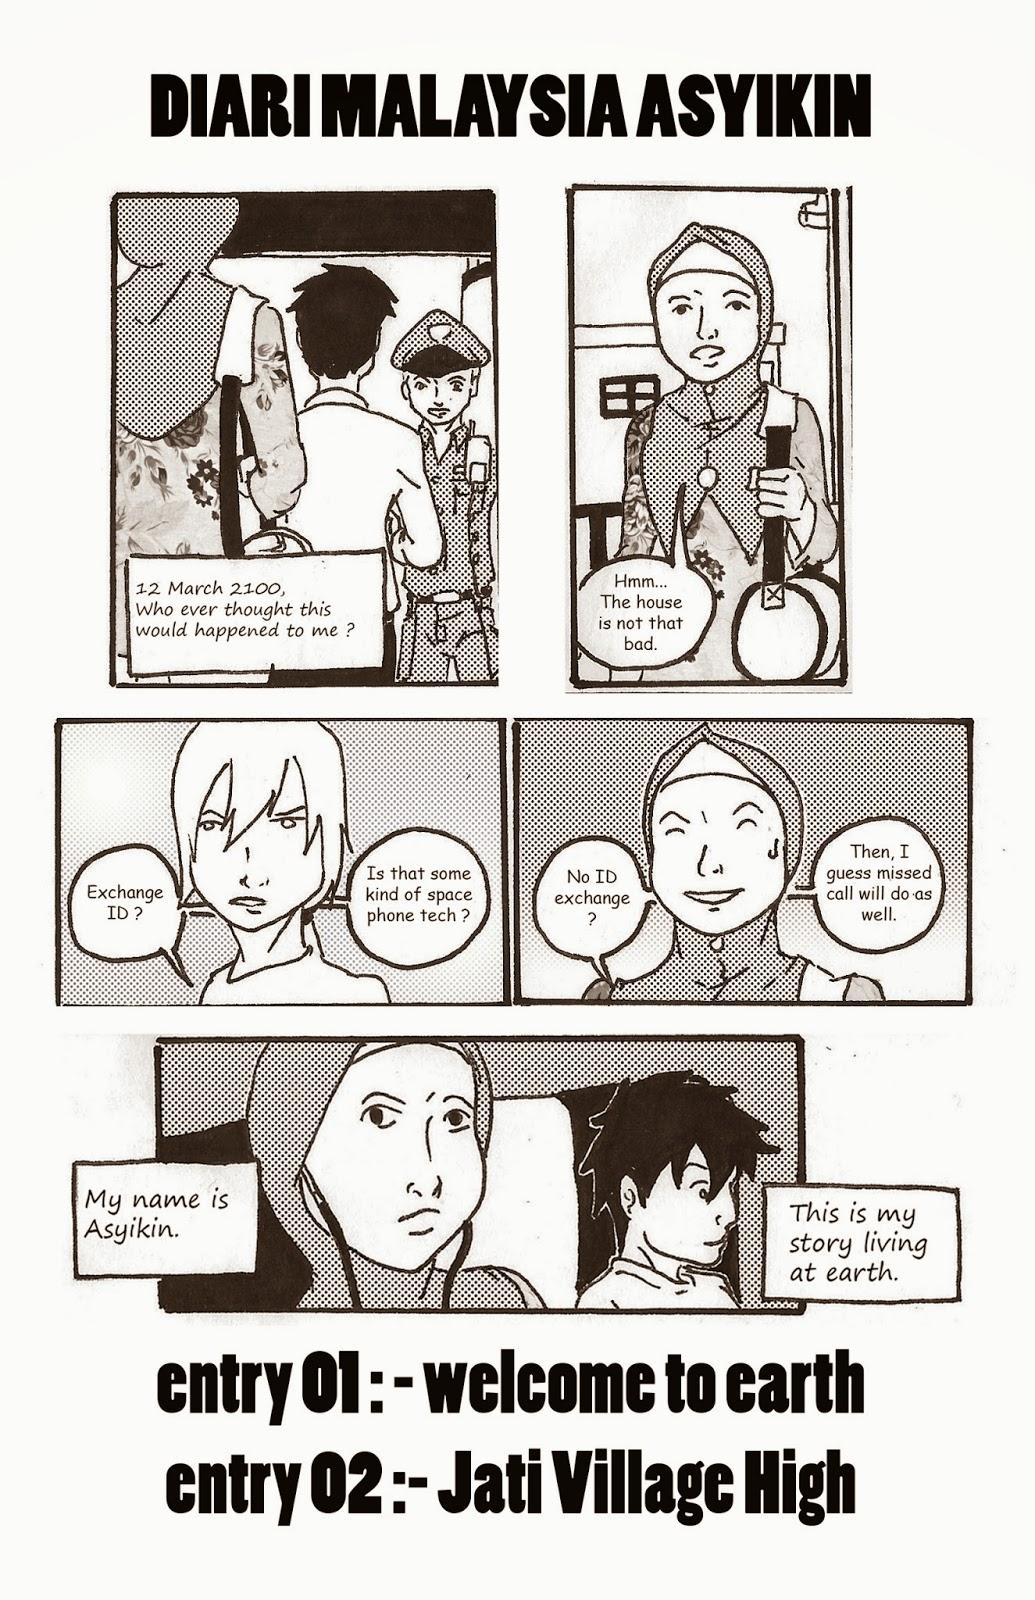 http://www.inkblazers.com/read-manga/Diari-Malaysia-Asyikin-Chapter-1-Welcome-To-Earth/6668/0/0?lang=en